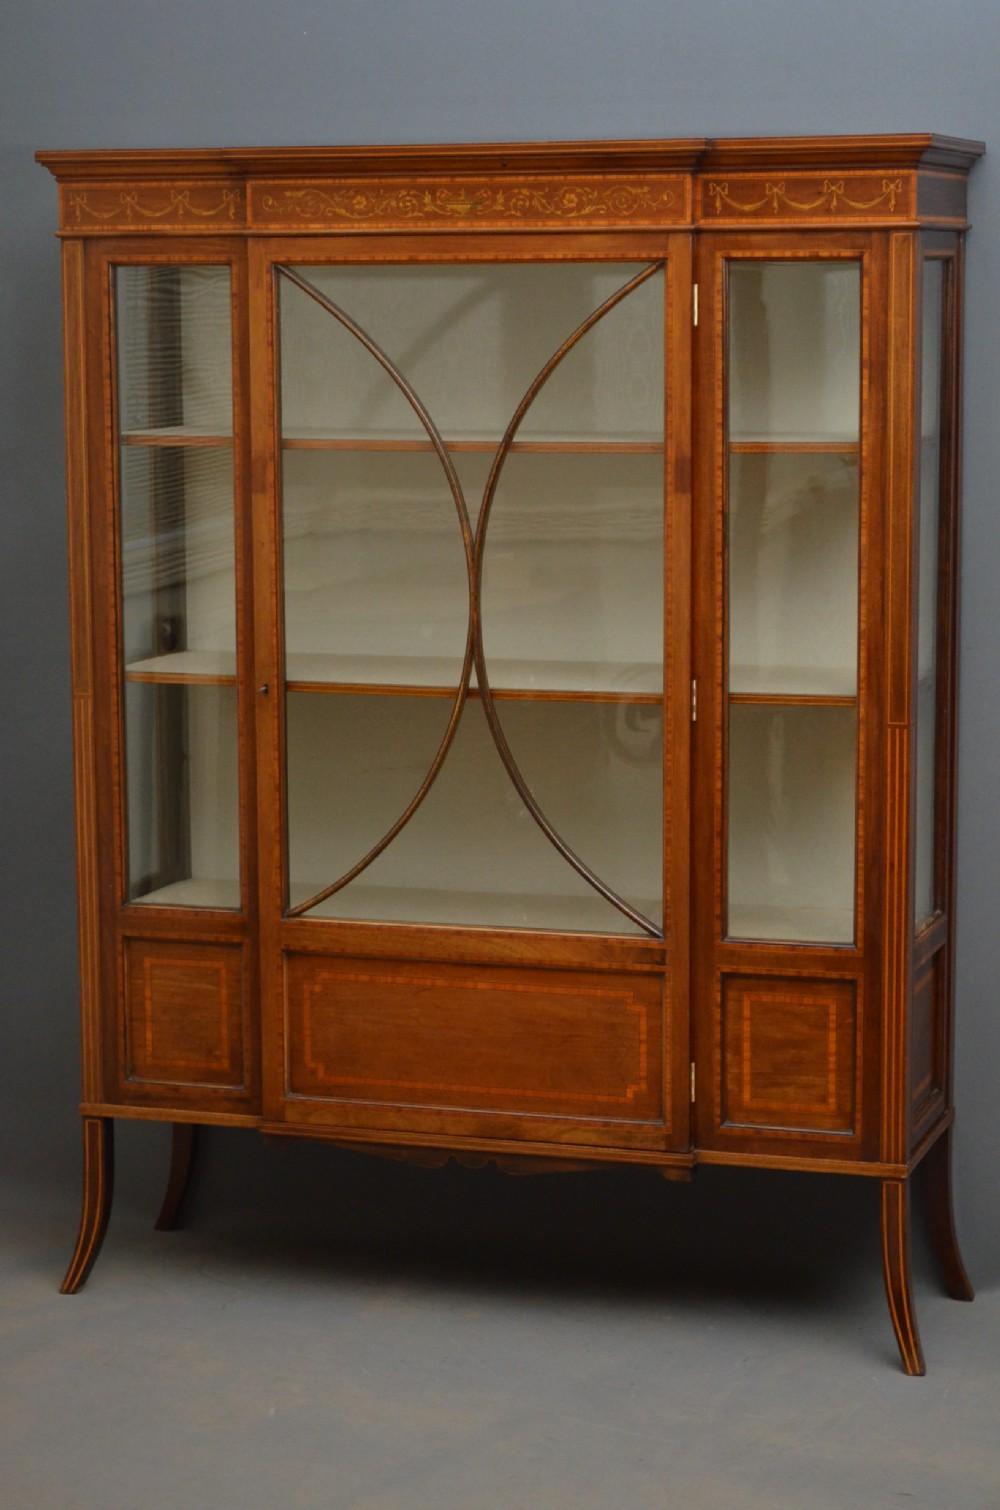 edwardian display cabinet vitrine - Edwardian Display Cabinet - Vitrine 251886 Sellingantiques.co.uk